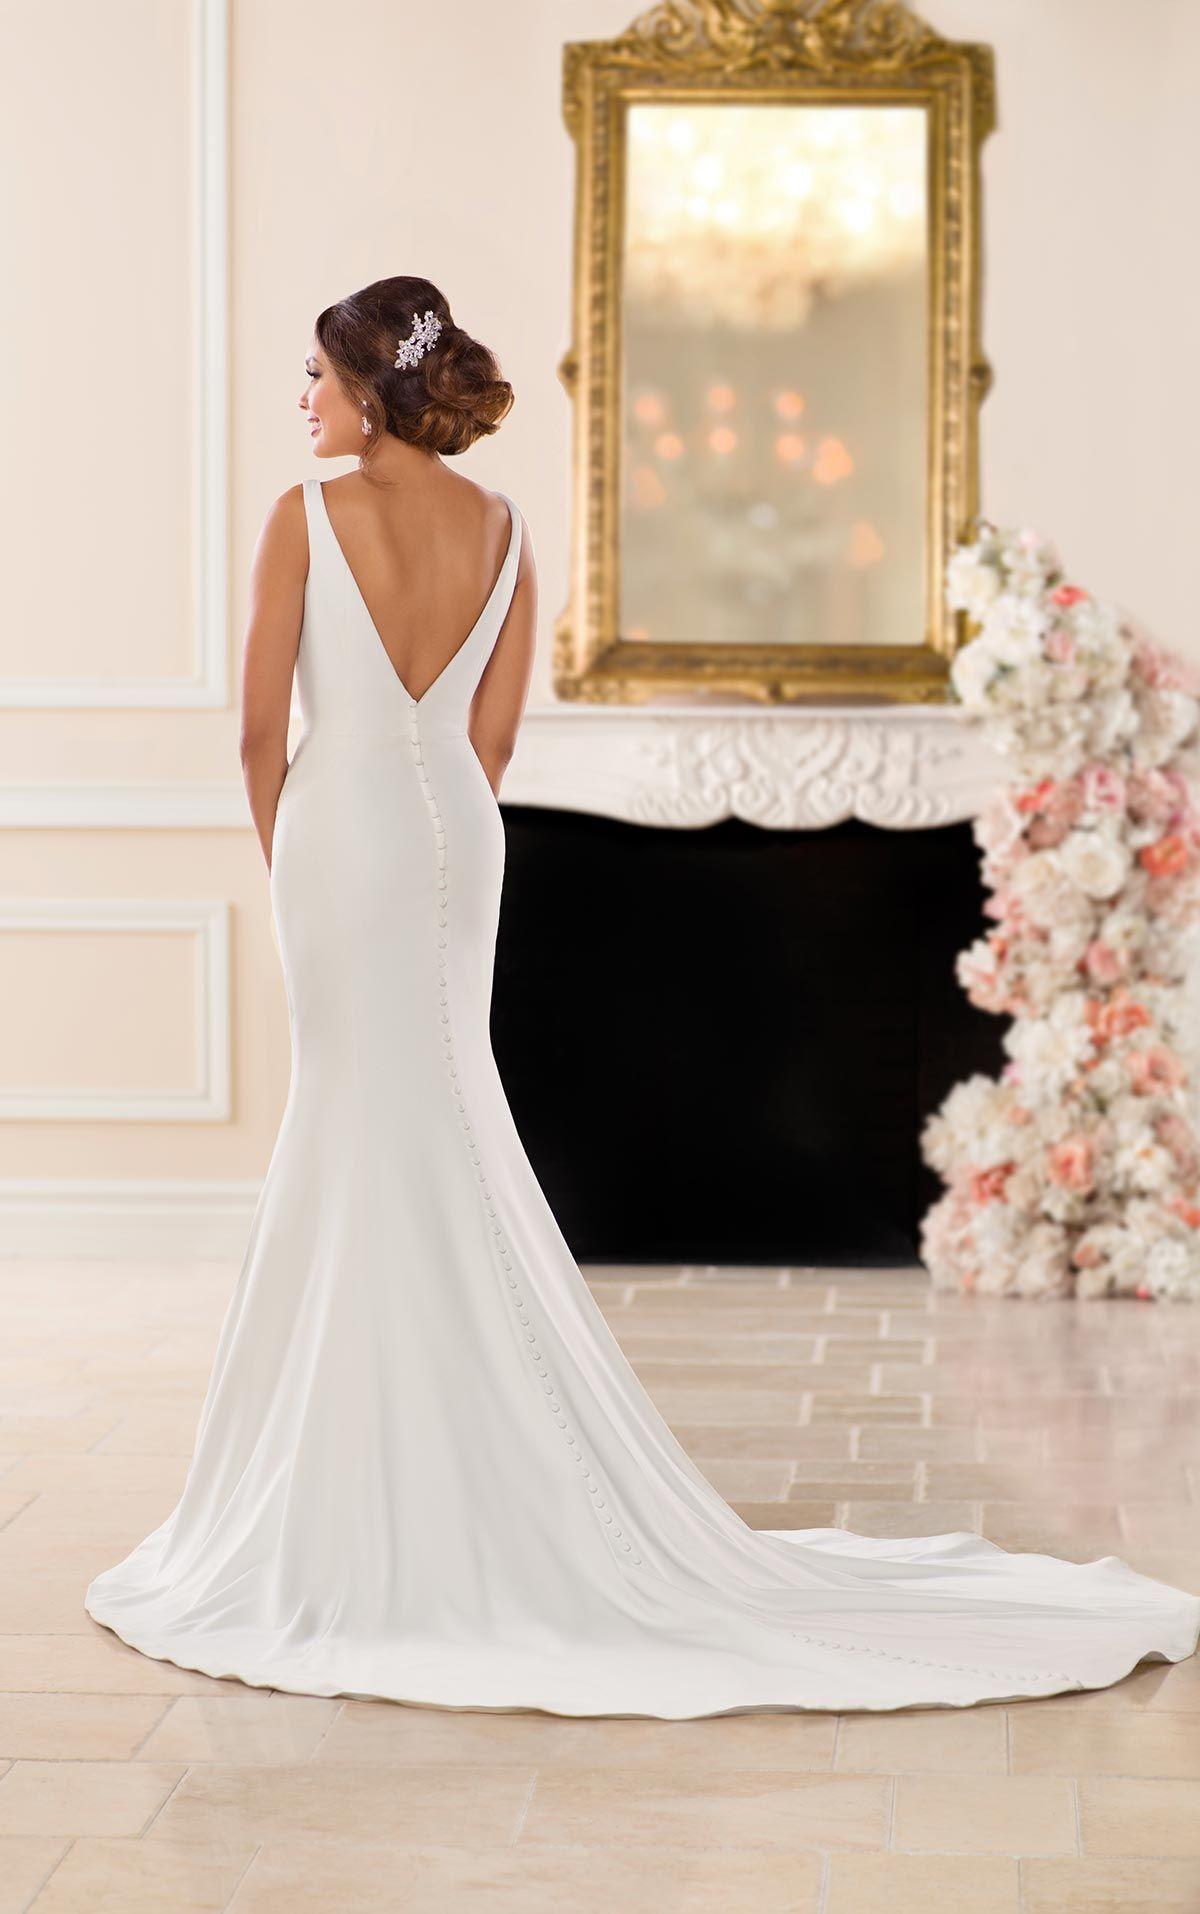 Simple sophisticated wedding dress in wedding dresses